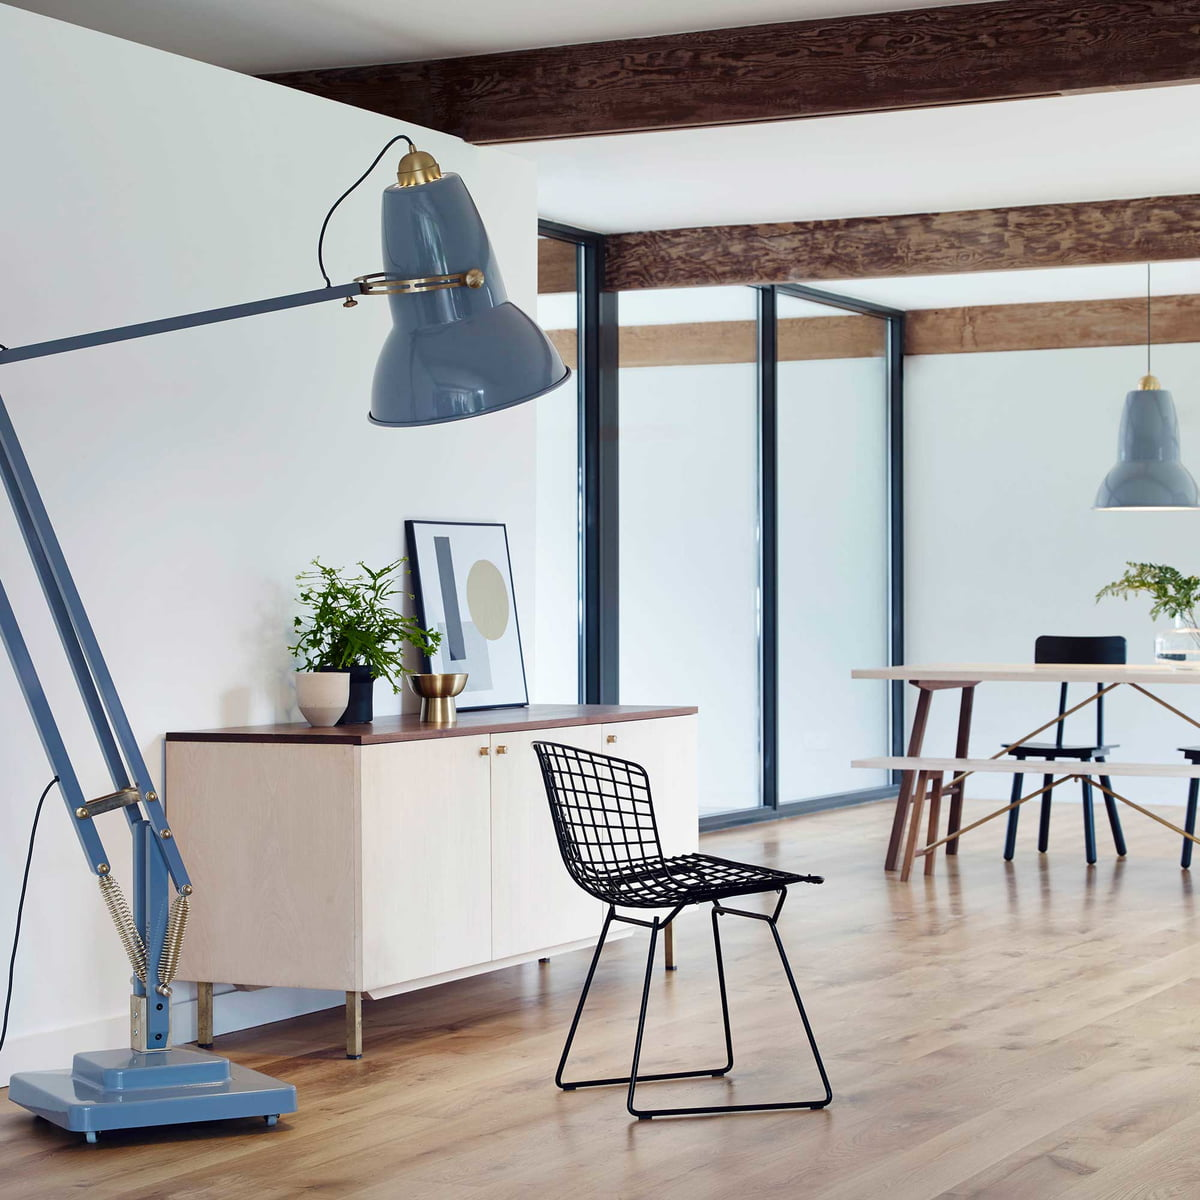 bertoia stuhl best bertoia stuhl knoll with bertoia stuhl. Black Bedroom Furniture Sets. Home Design Ideas